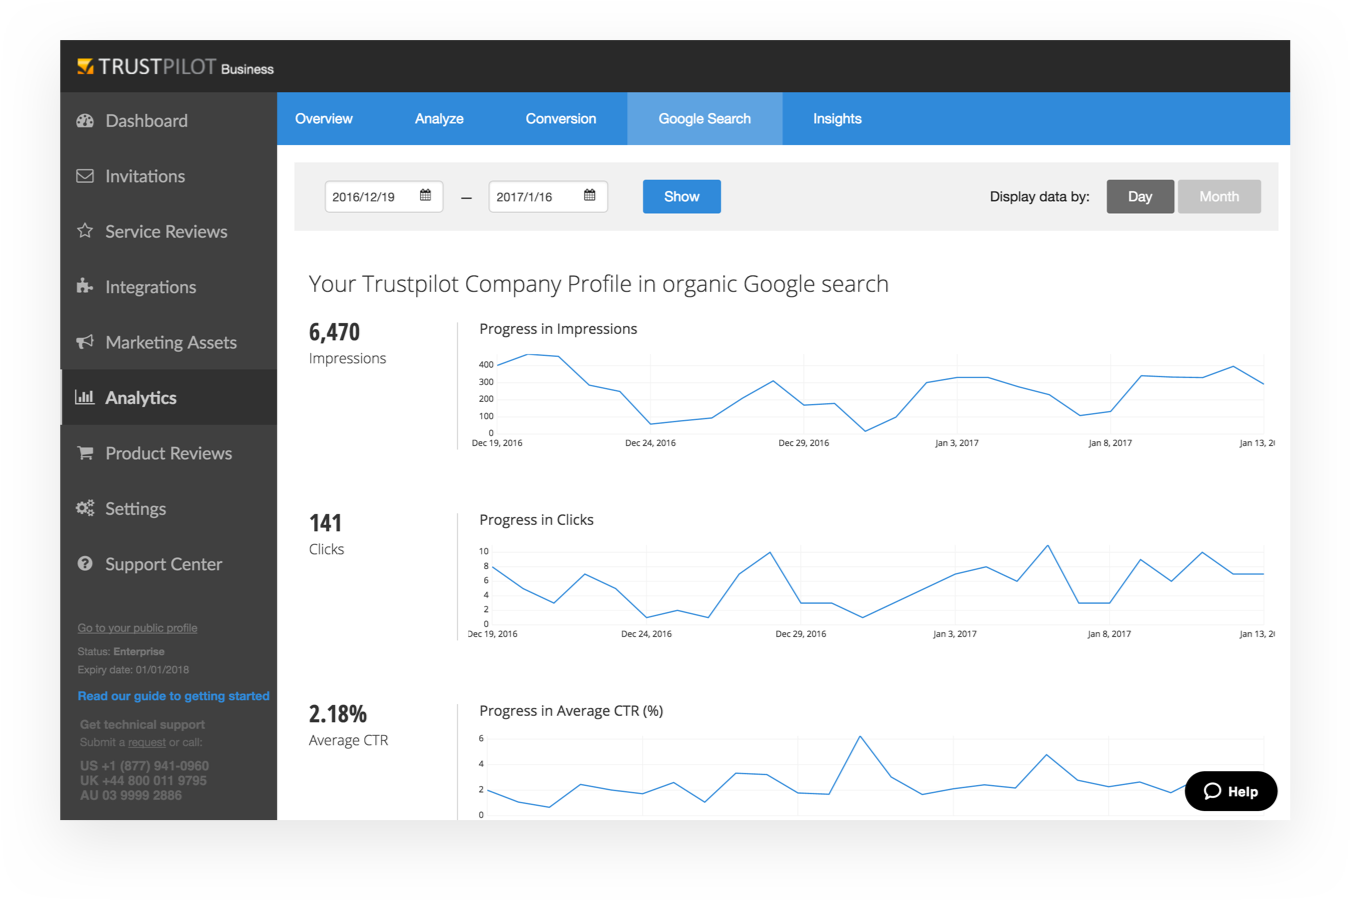 Trustpilot google search analysis